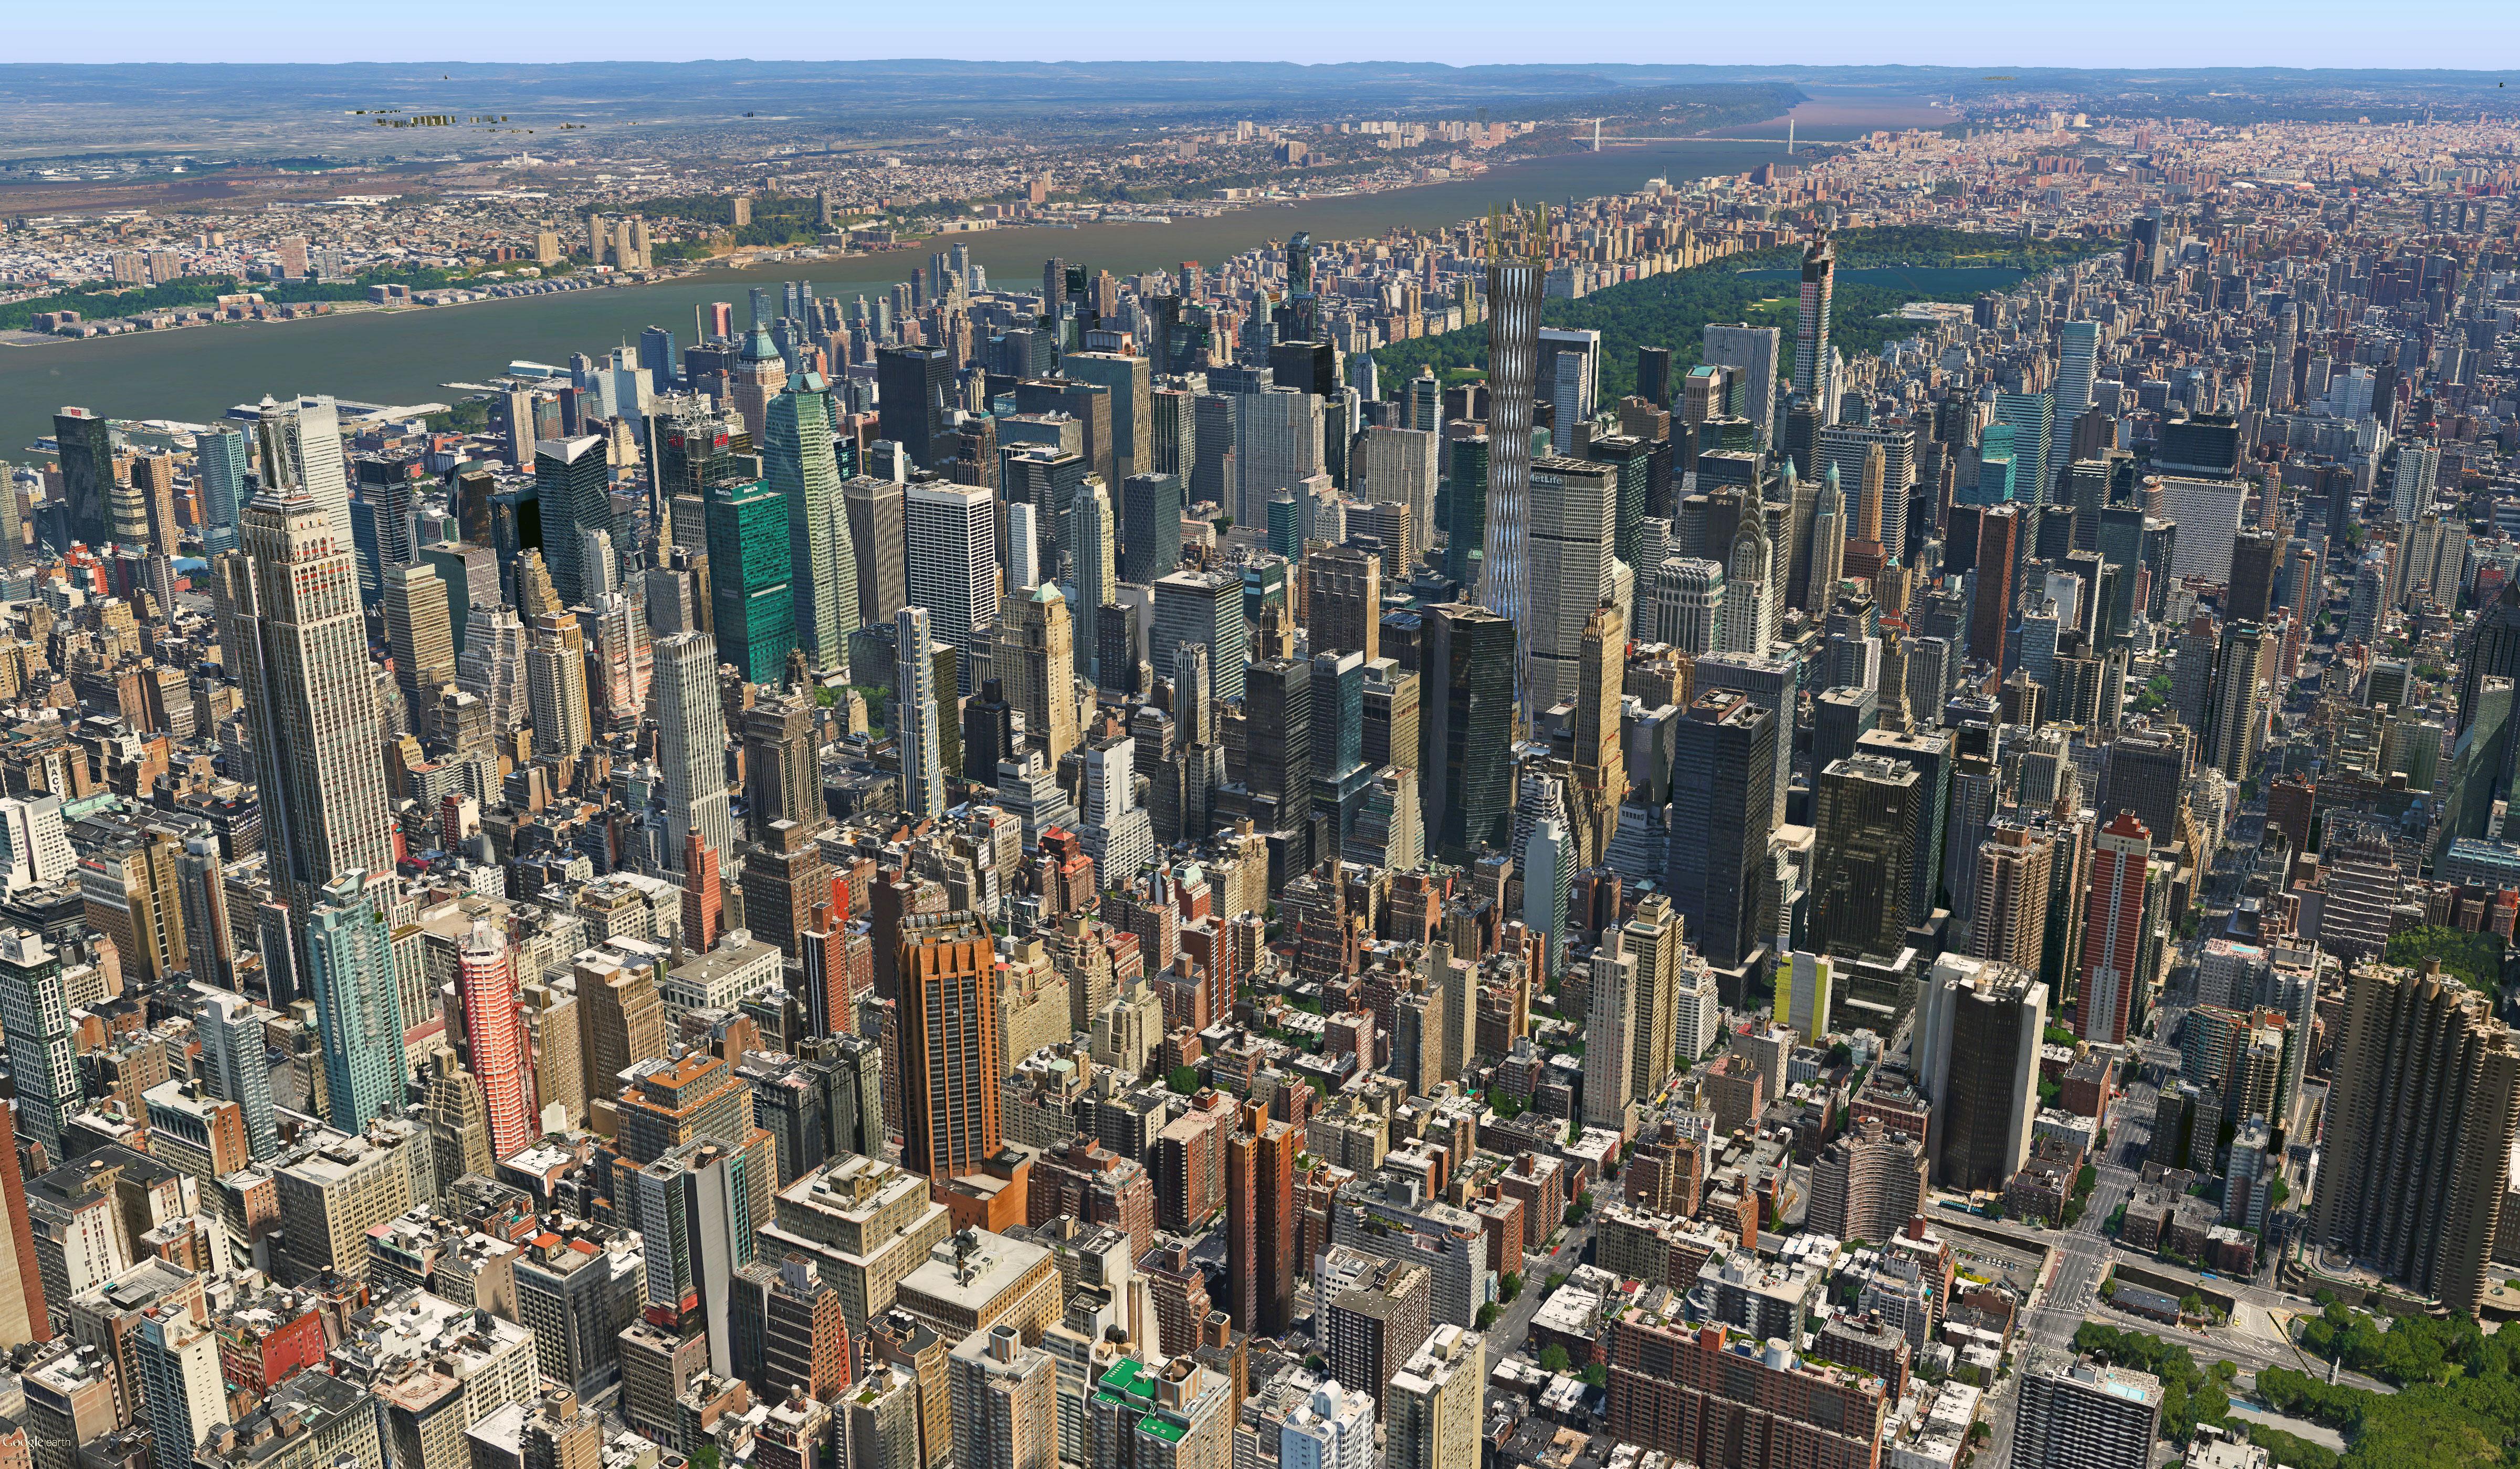 Hyperboloid, I.M. Pei, never-built NYC, Grand Central demolition